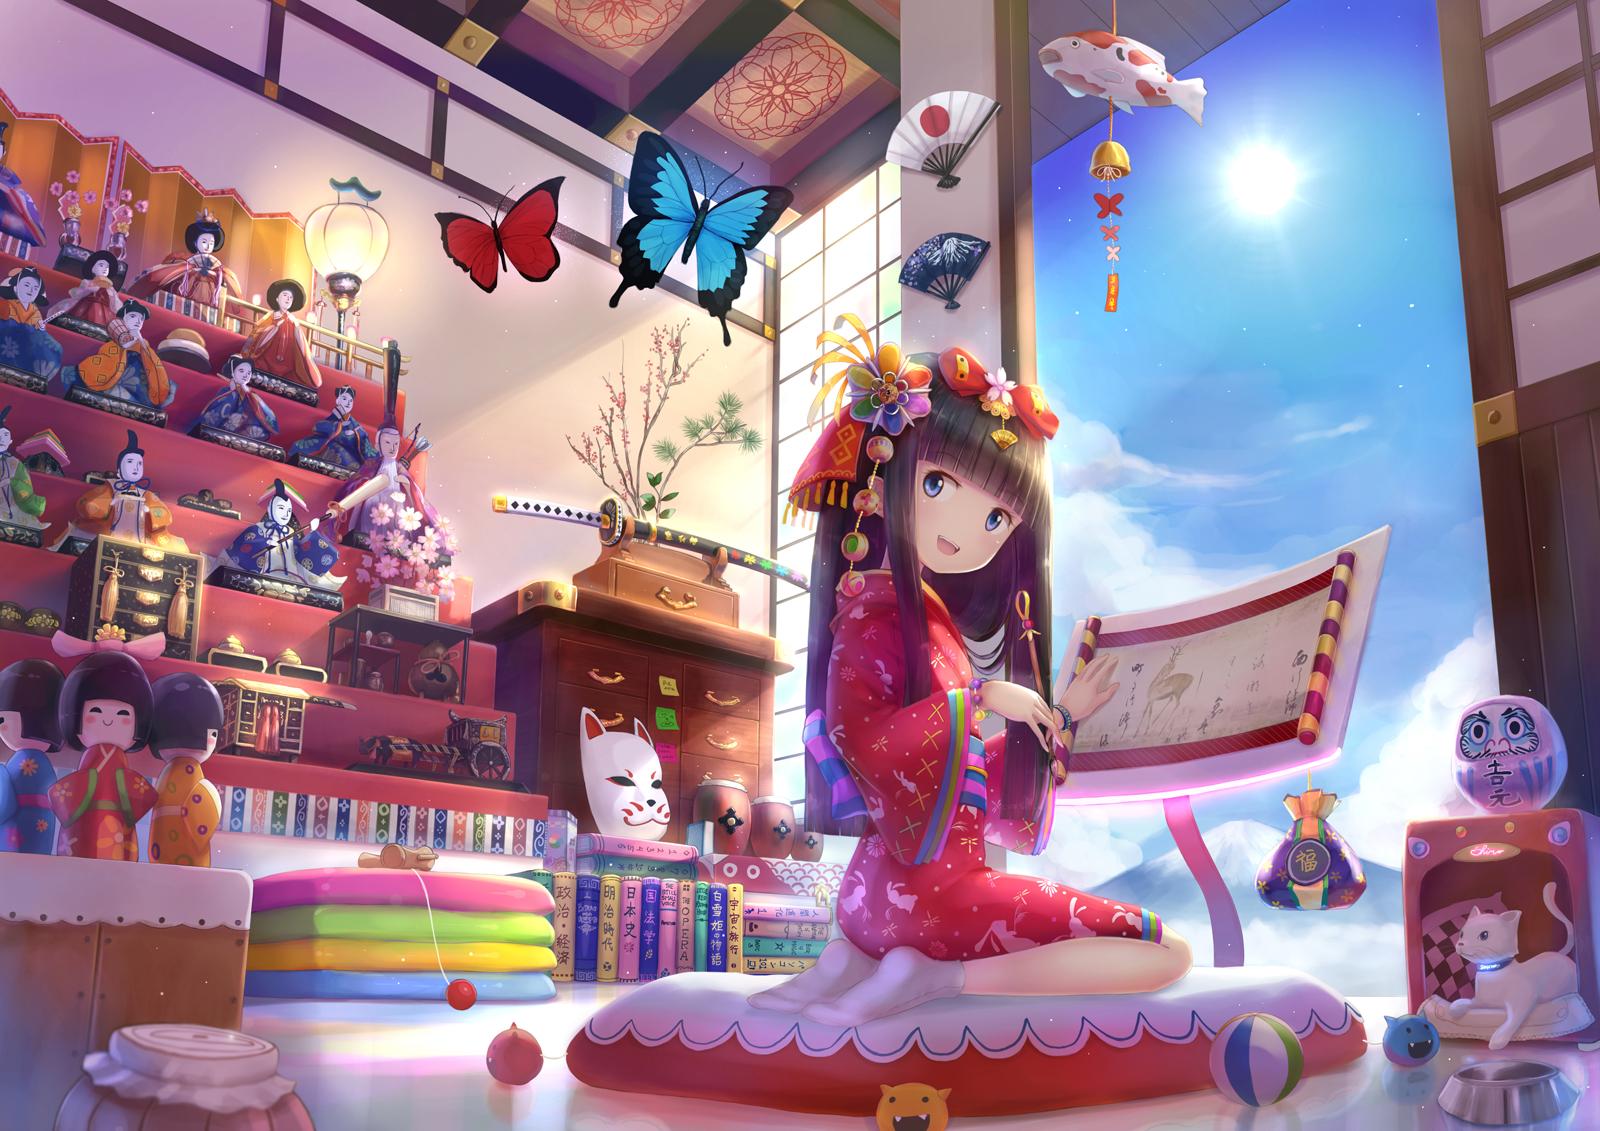 hinh nen anime girl dang yeu 24